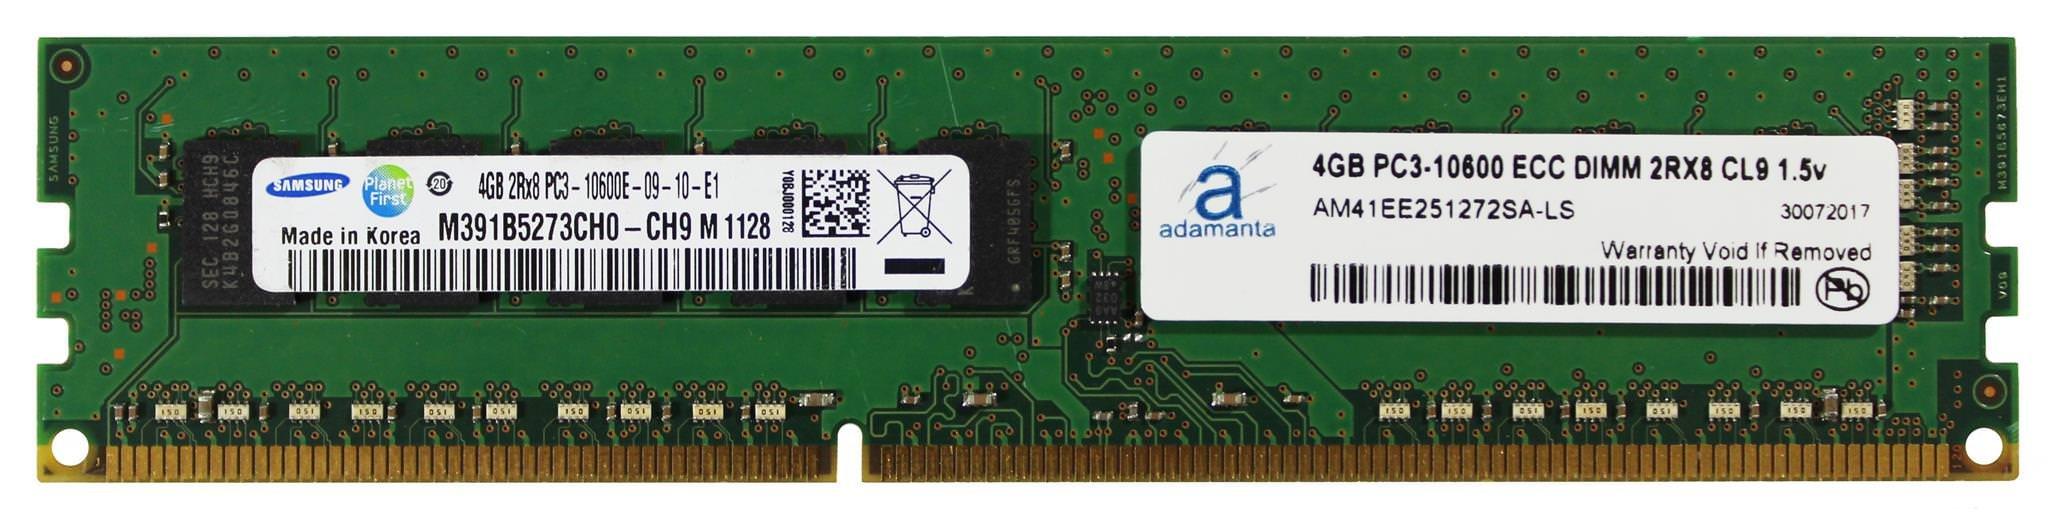 Samsung Original 4GB (1x4GB) Server Memory Upgrade for Servers DDR3 1333MHz PC3-10600 ECC Unbuffered 2Rx8 CL9 1.5v RAM DRAM